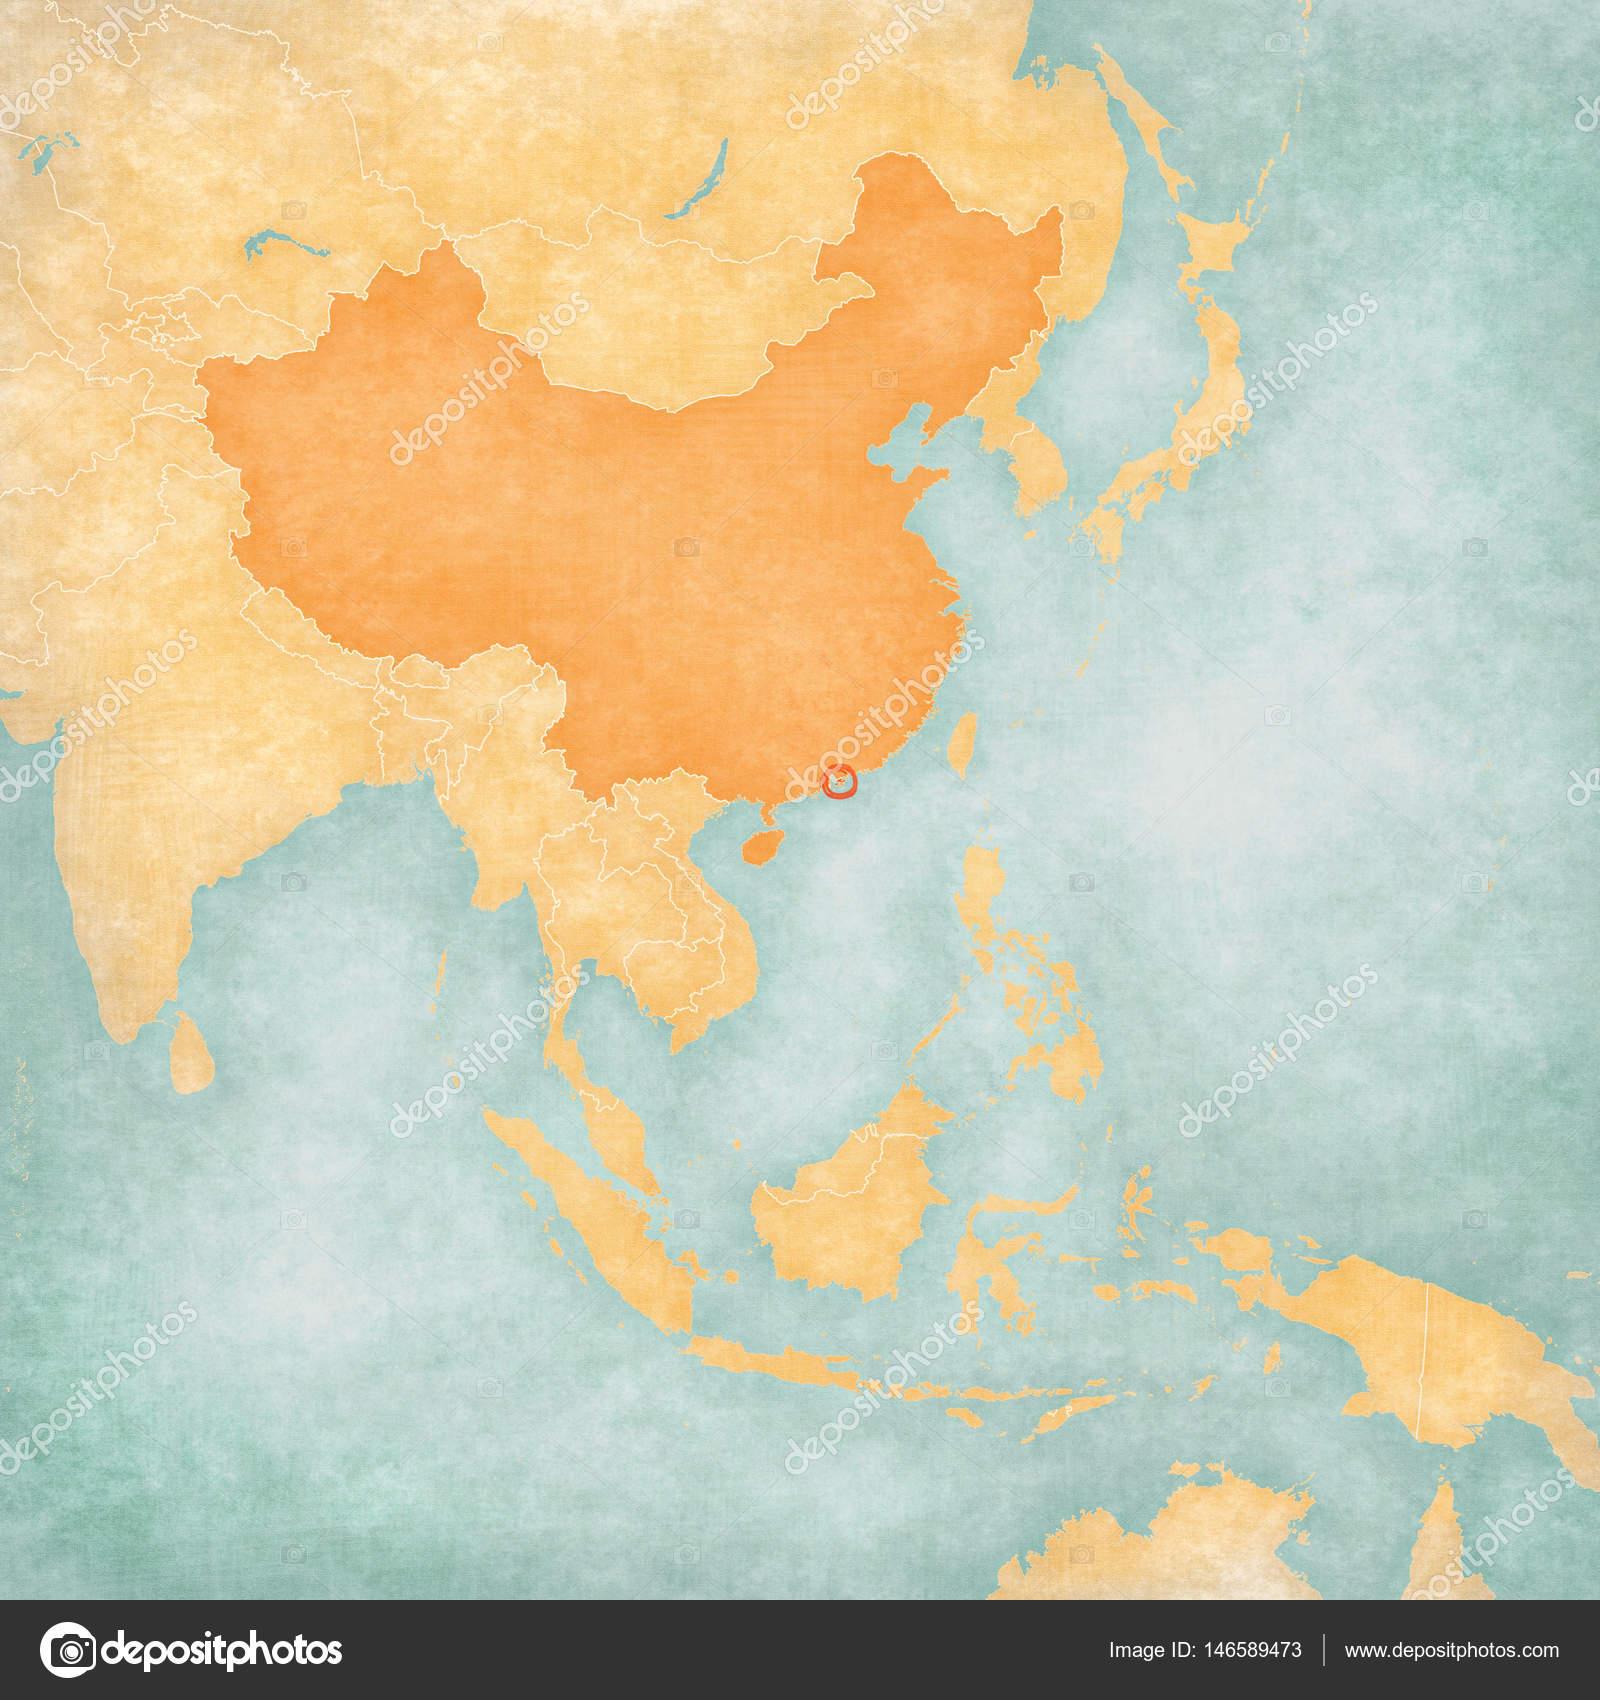 Map Of Asia Hong Kong.Map Of East Asia Hong Kong Stock Photo C Tindo 146589473